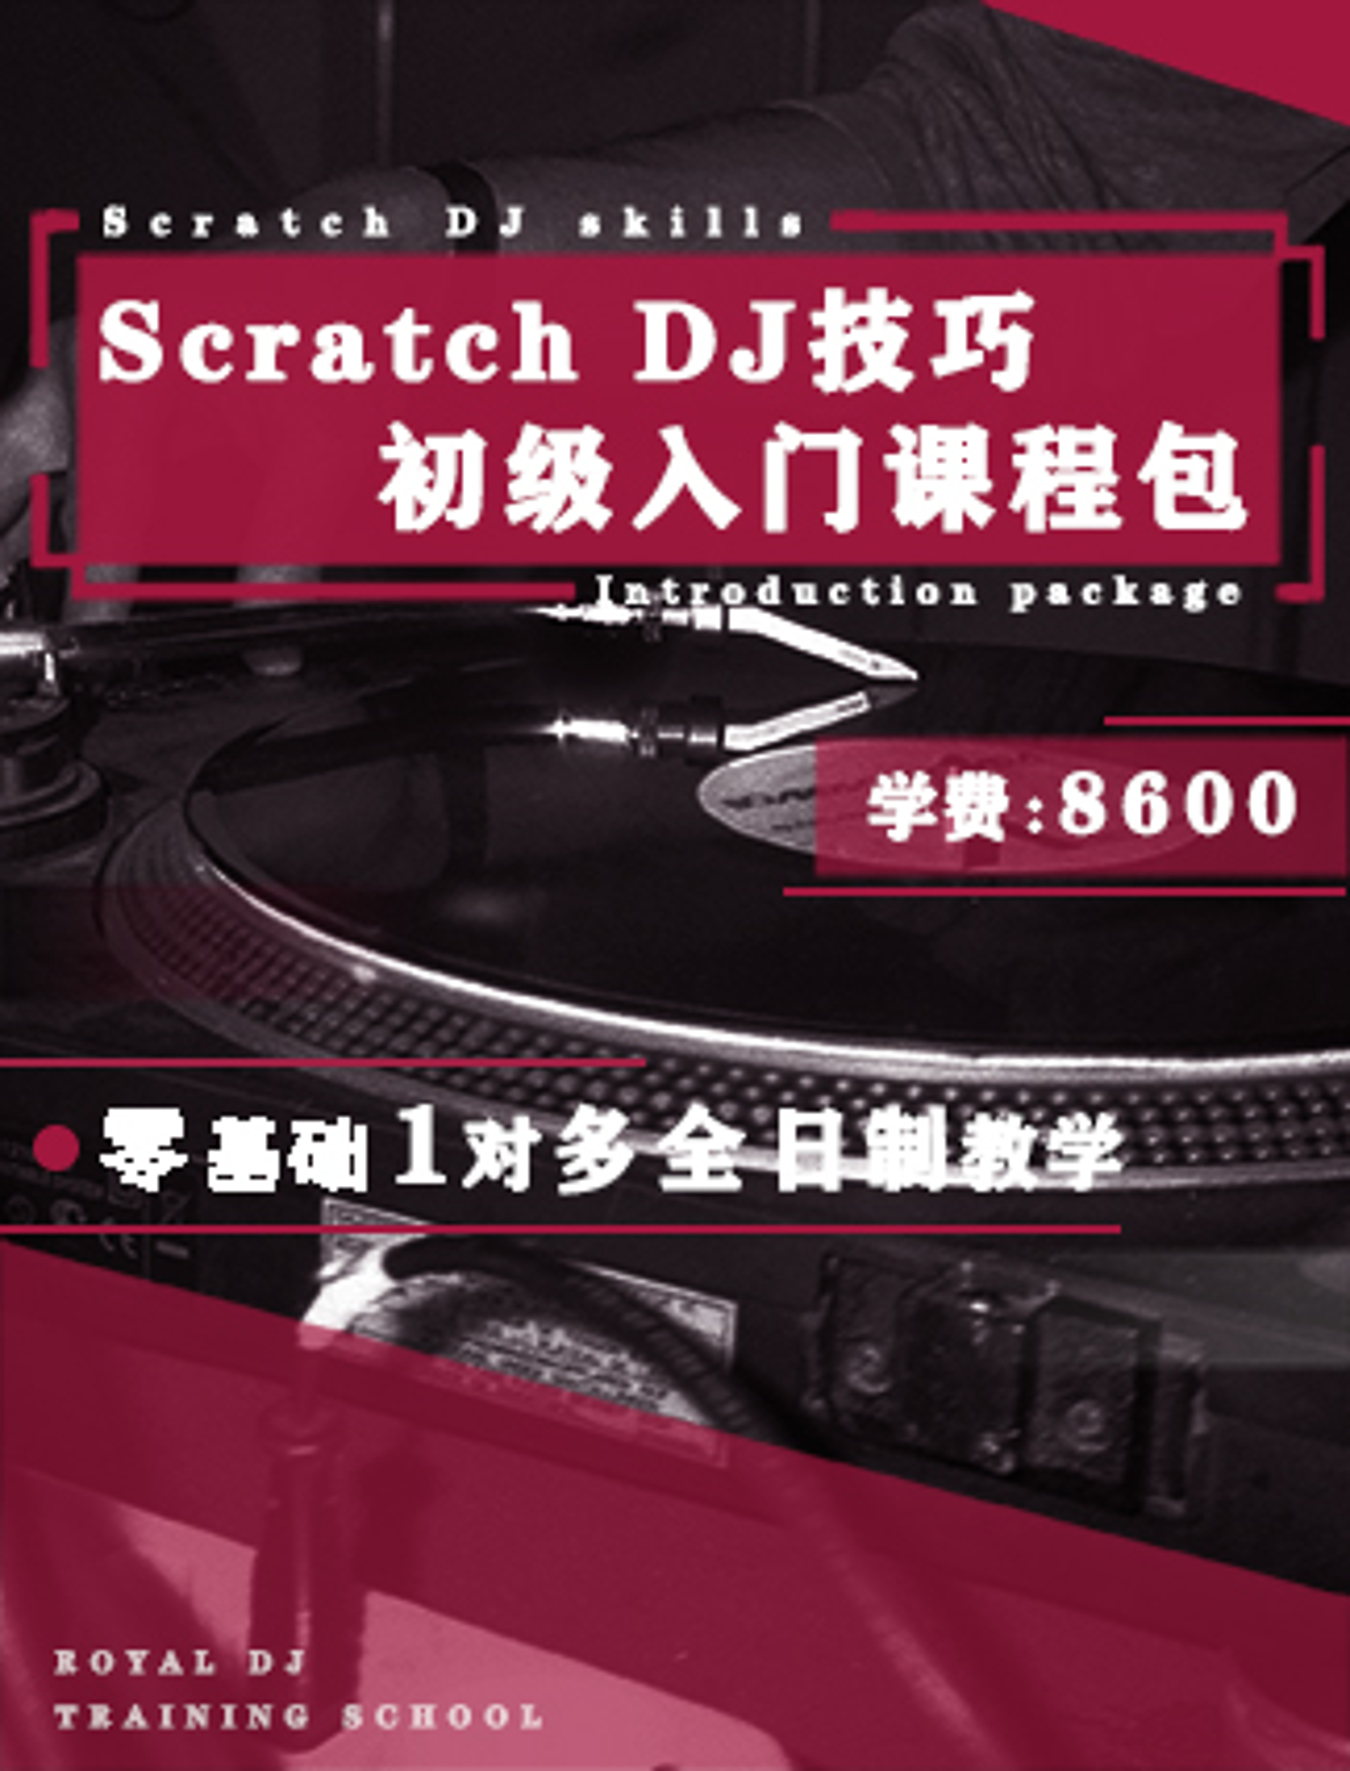 Scratch DJ技巧初级入门课程包